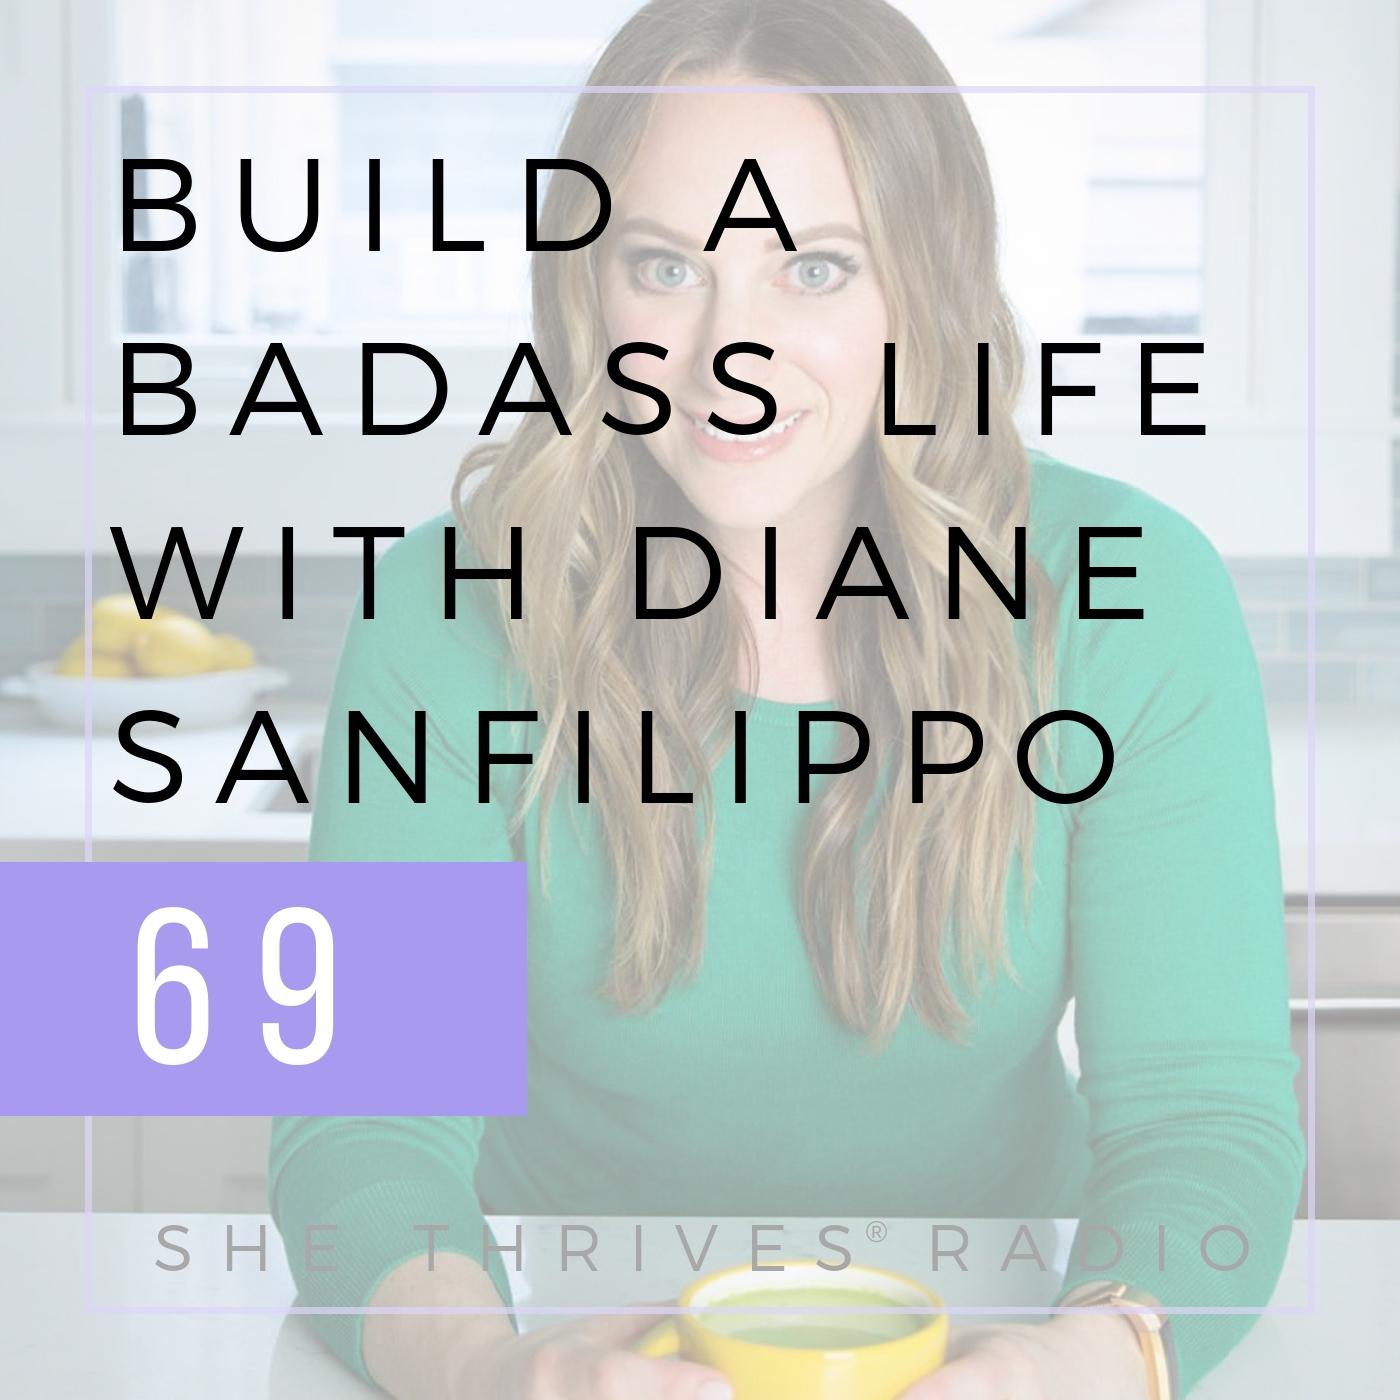 69 | Building a Badass Life with Diane Sanfilippo  | SHE THRIVES RADIO